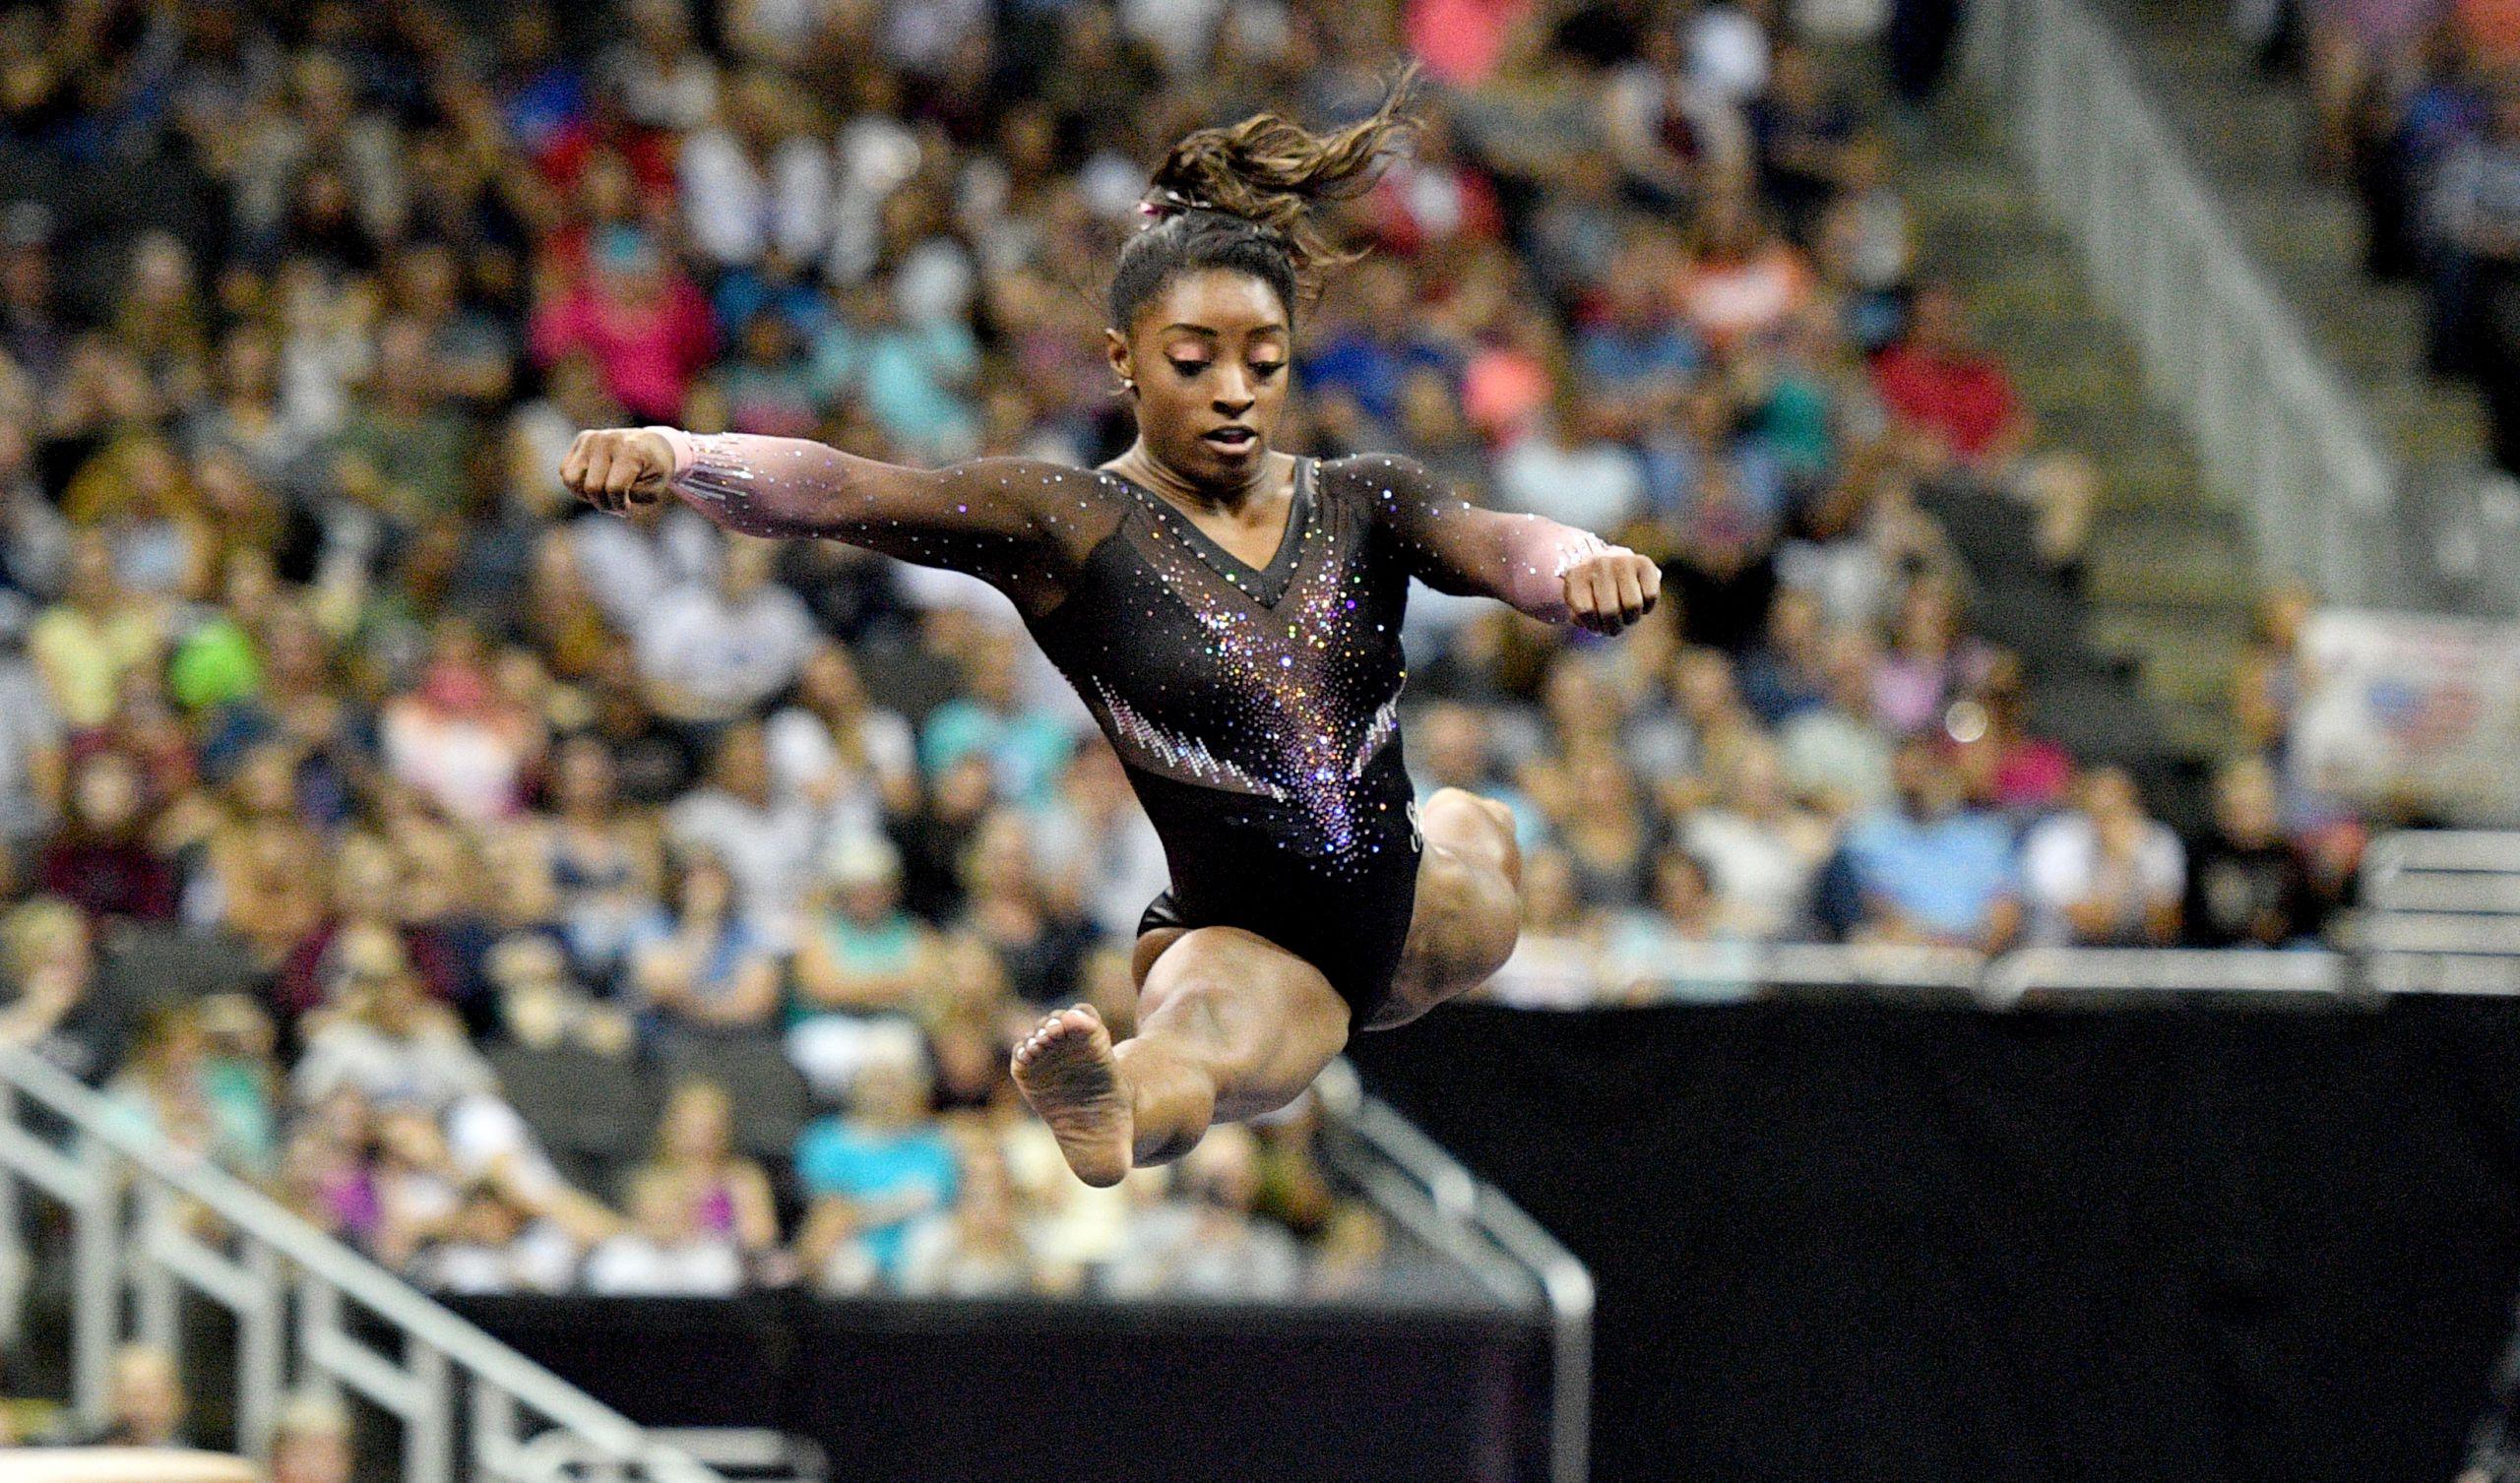 Simone Biles 2019 U.S. Gymnastics Championships